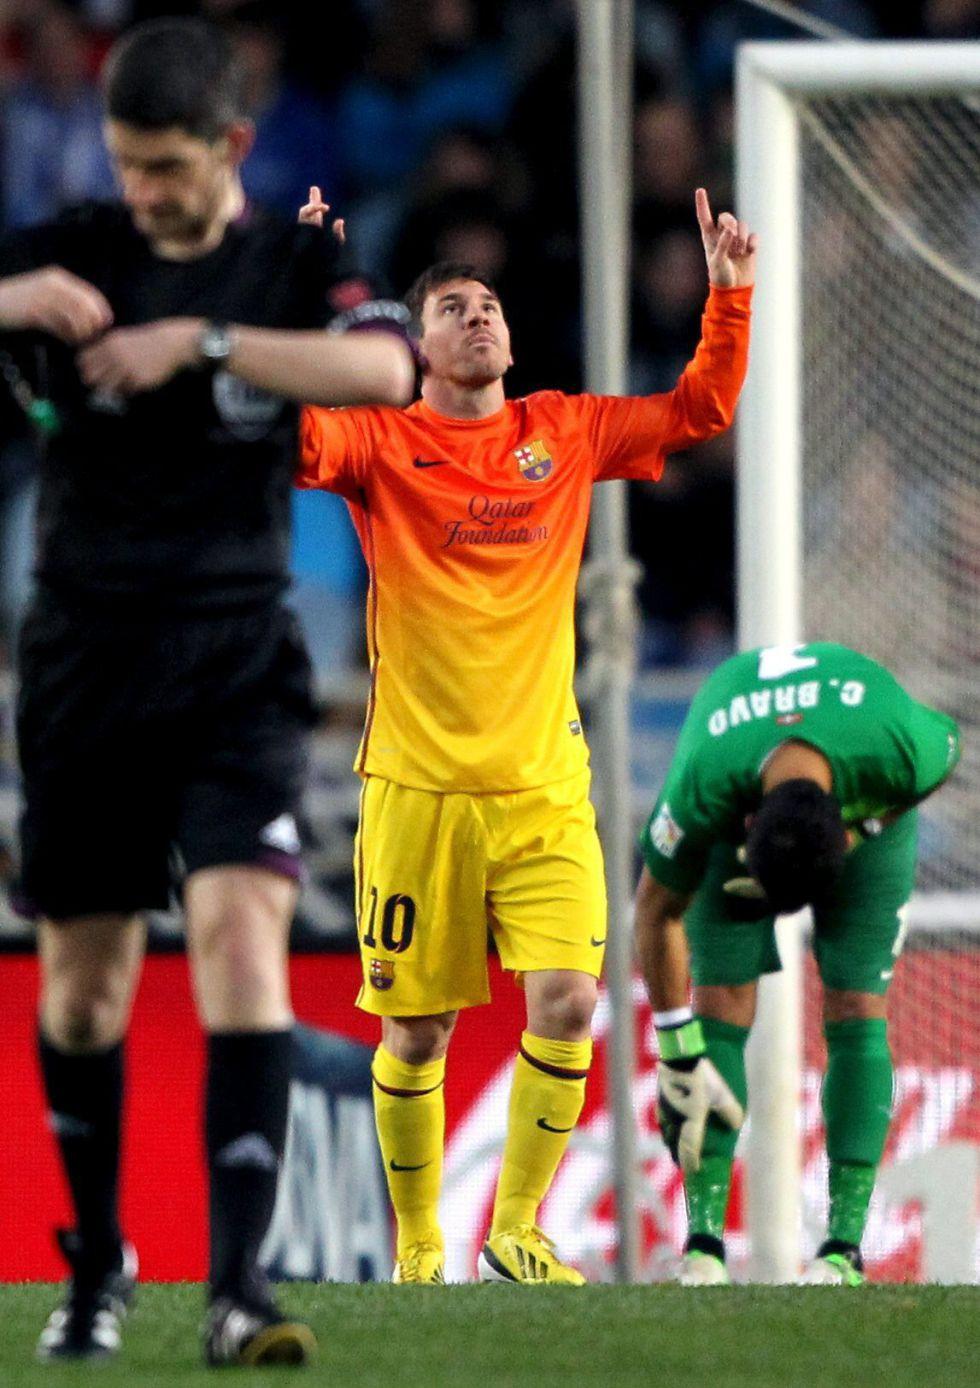 Messi iguala otro récord: diez jornadas consecutivas marcando